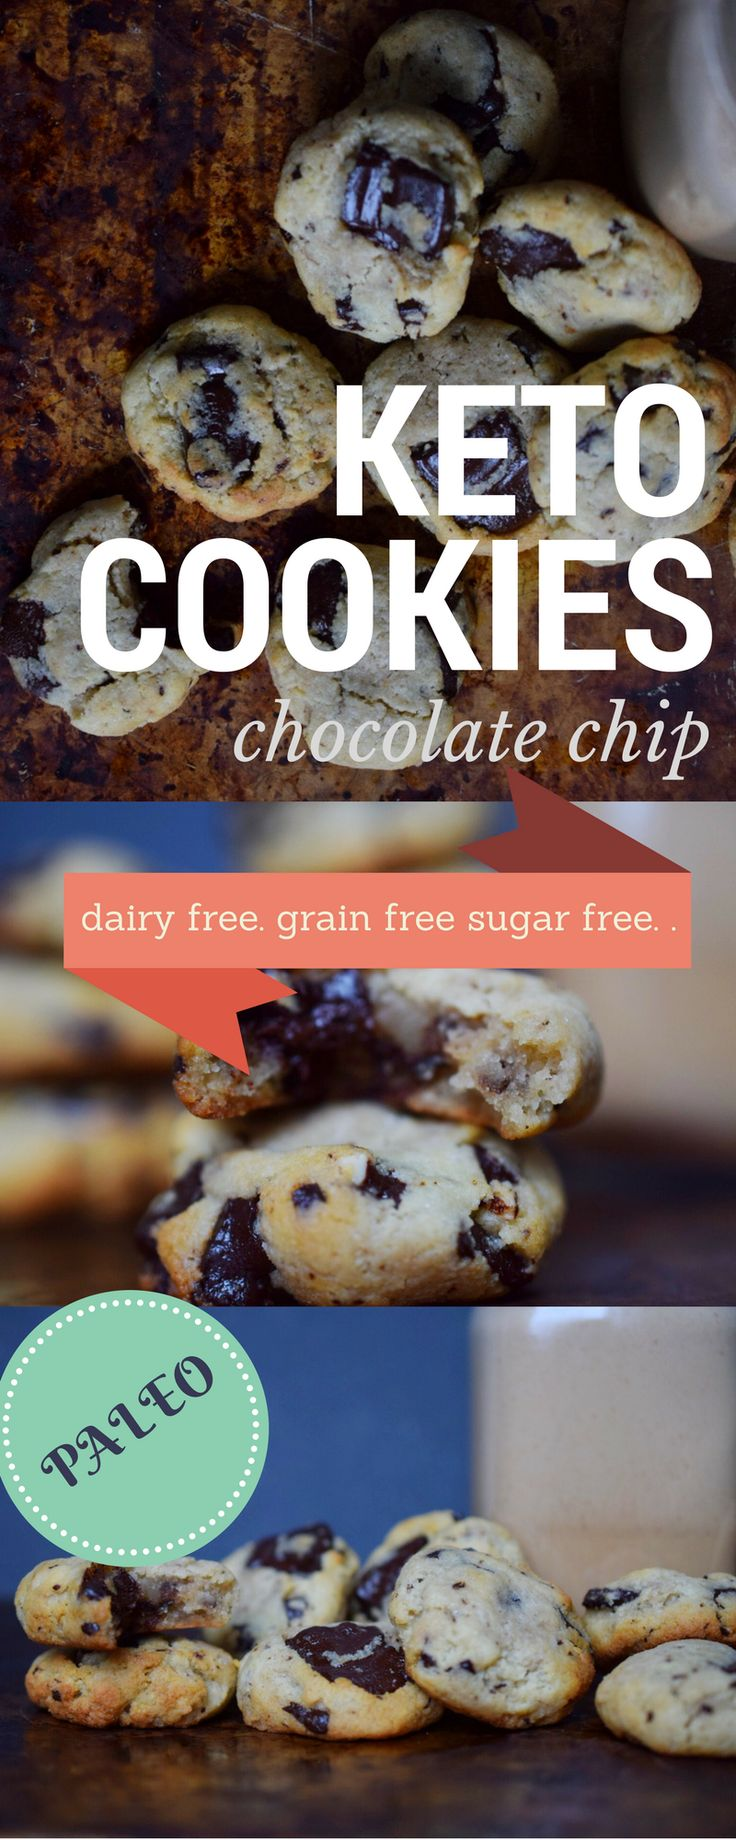 Chewy Chocolate Chip Cookies: Real Salt & Almond (Keto, Paleo, Sugar-free) – Castaway Kitchen